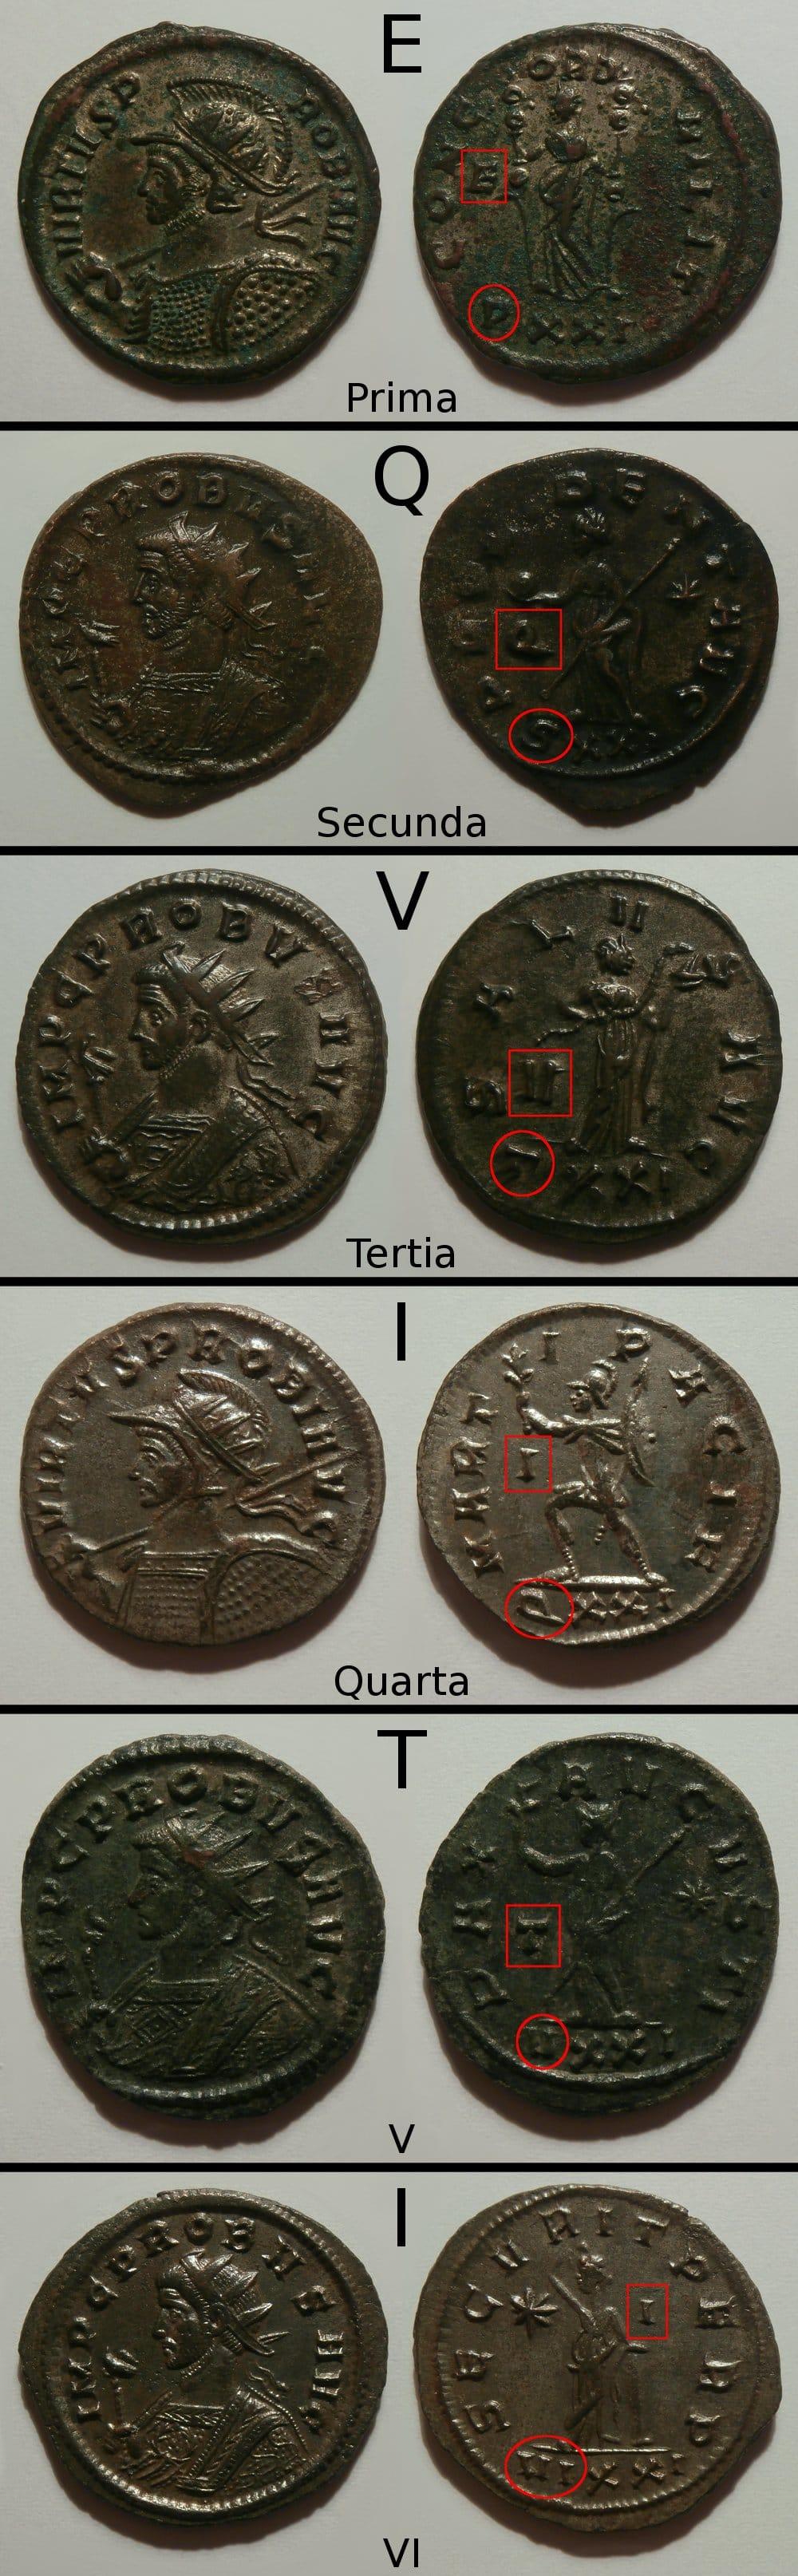 Antoninianos de Probo de la ceca Ticinum (serie EQVITI) EQVITI